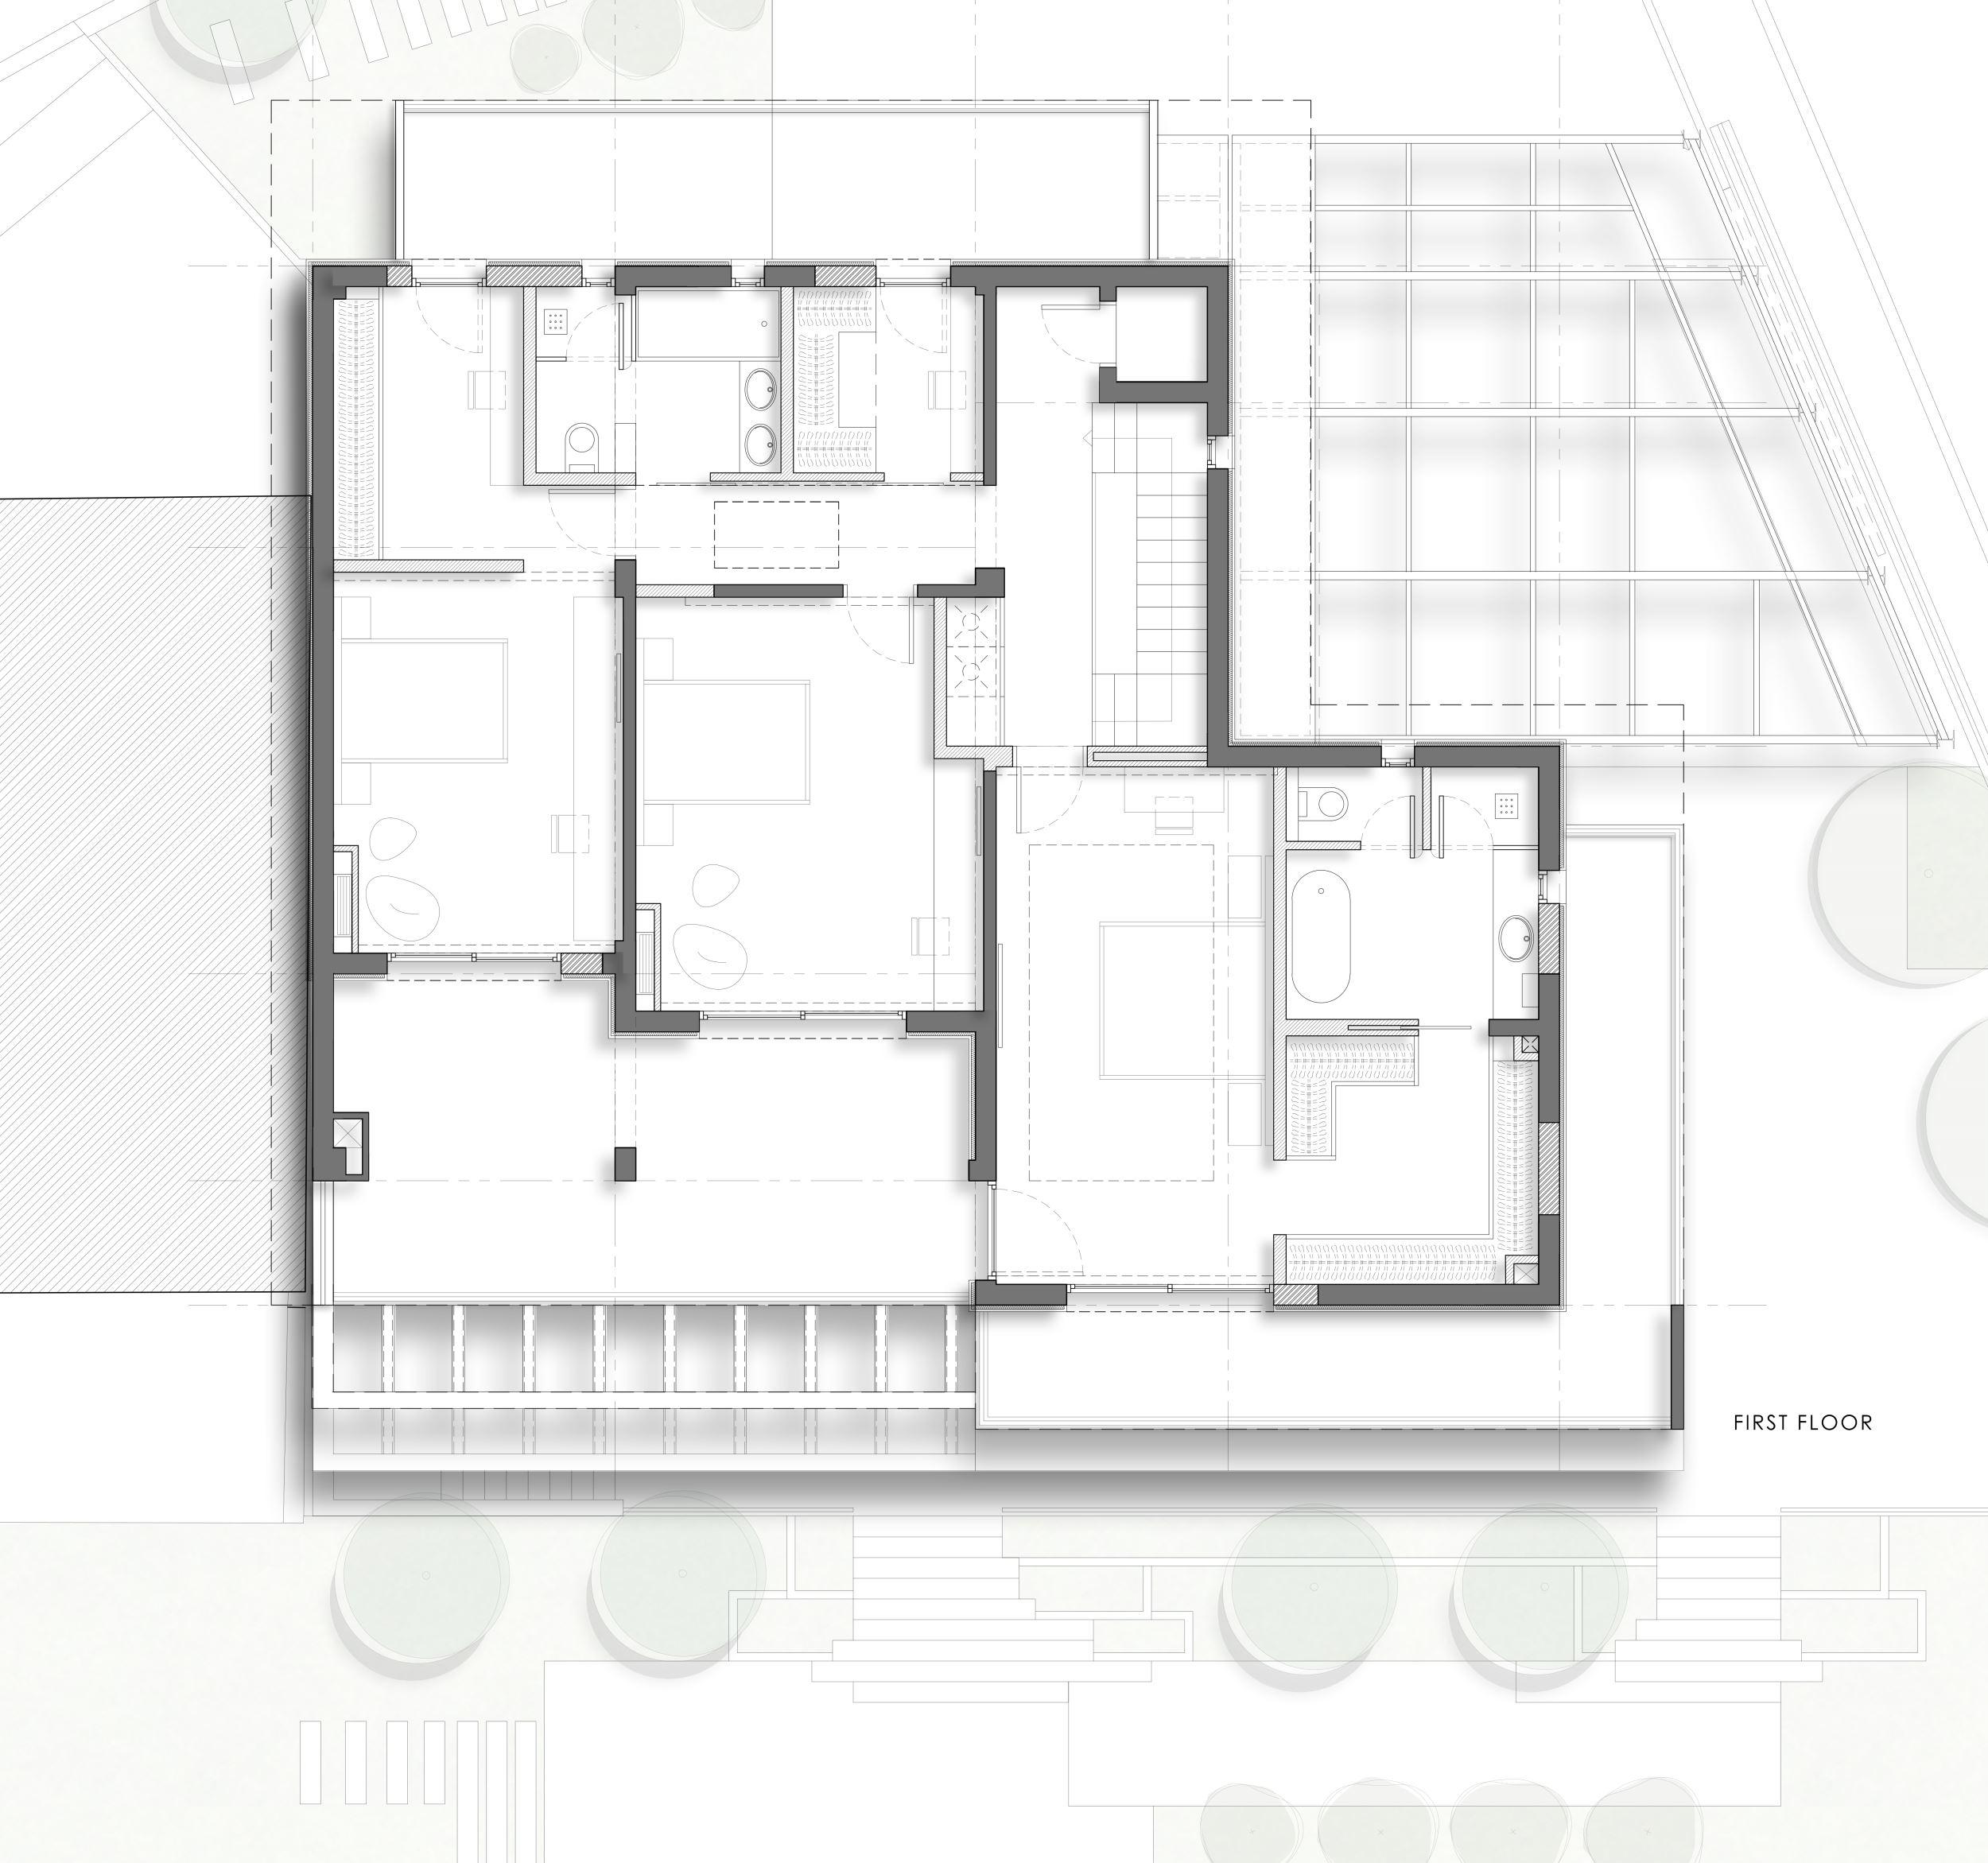 Deda & Architects